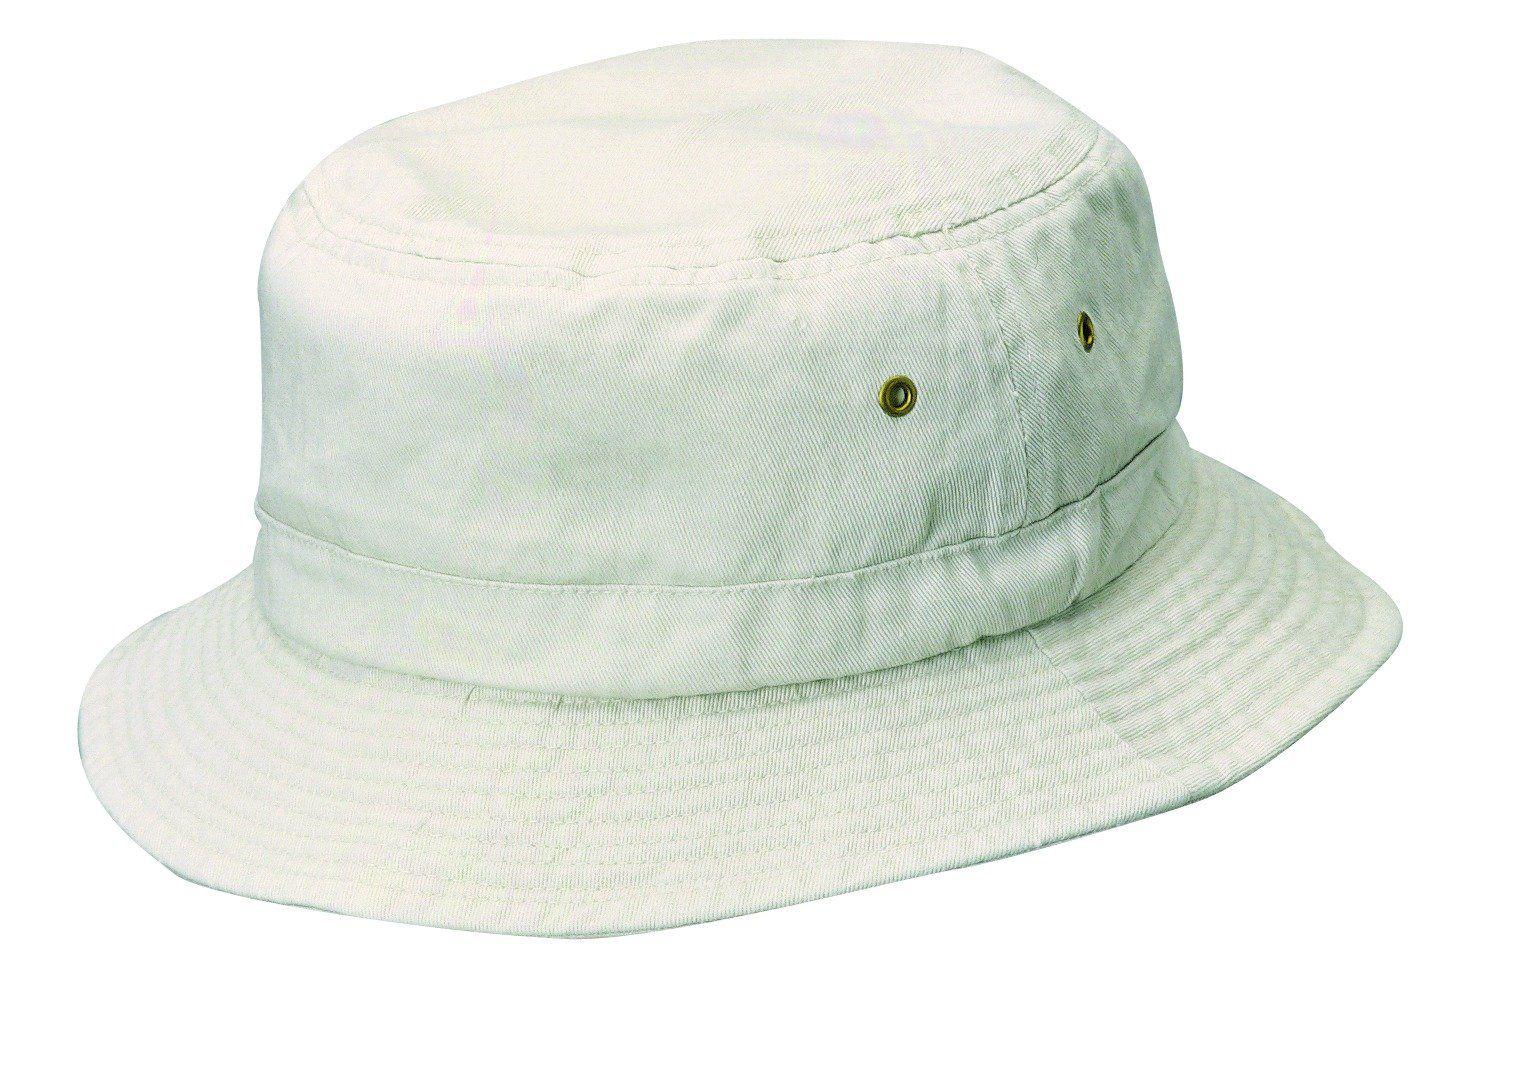 Robot Check Hats For Men Hats Outdoor Hats